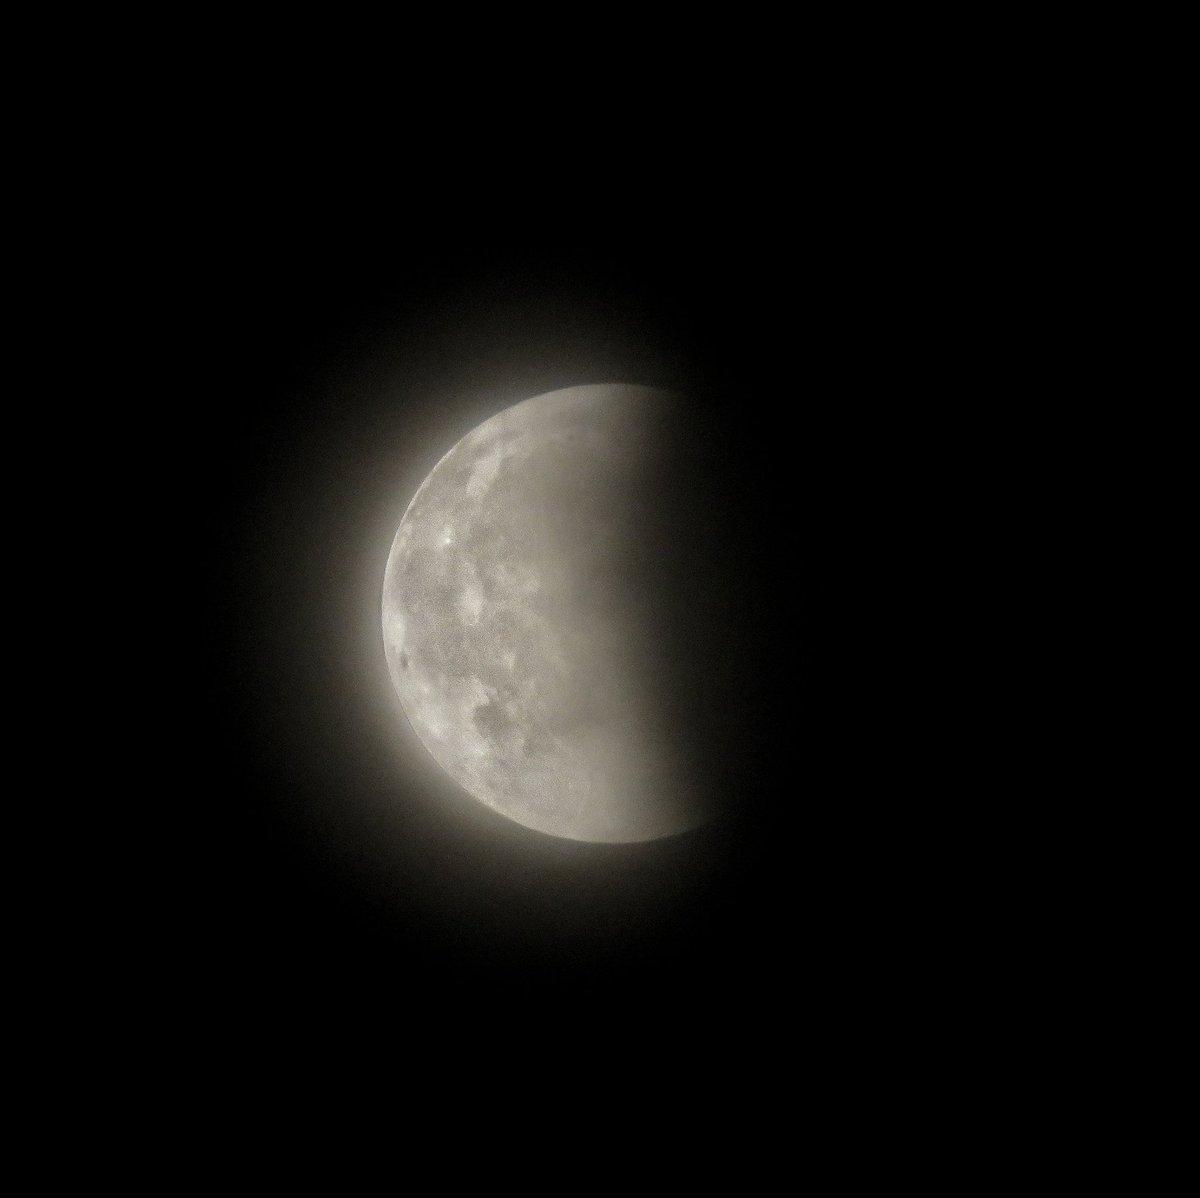 blood moon july 2018 ritual - photo #24